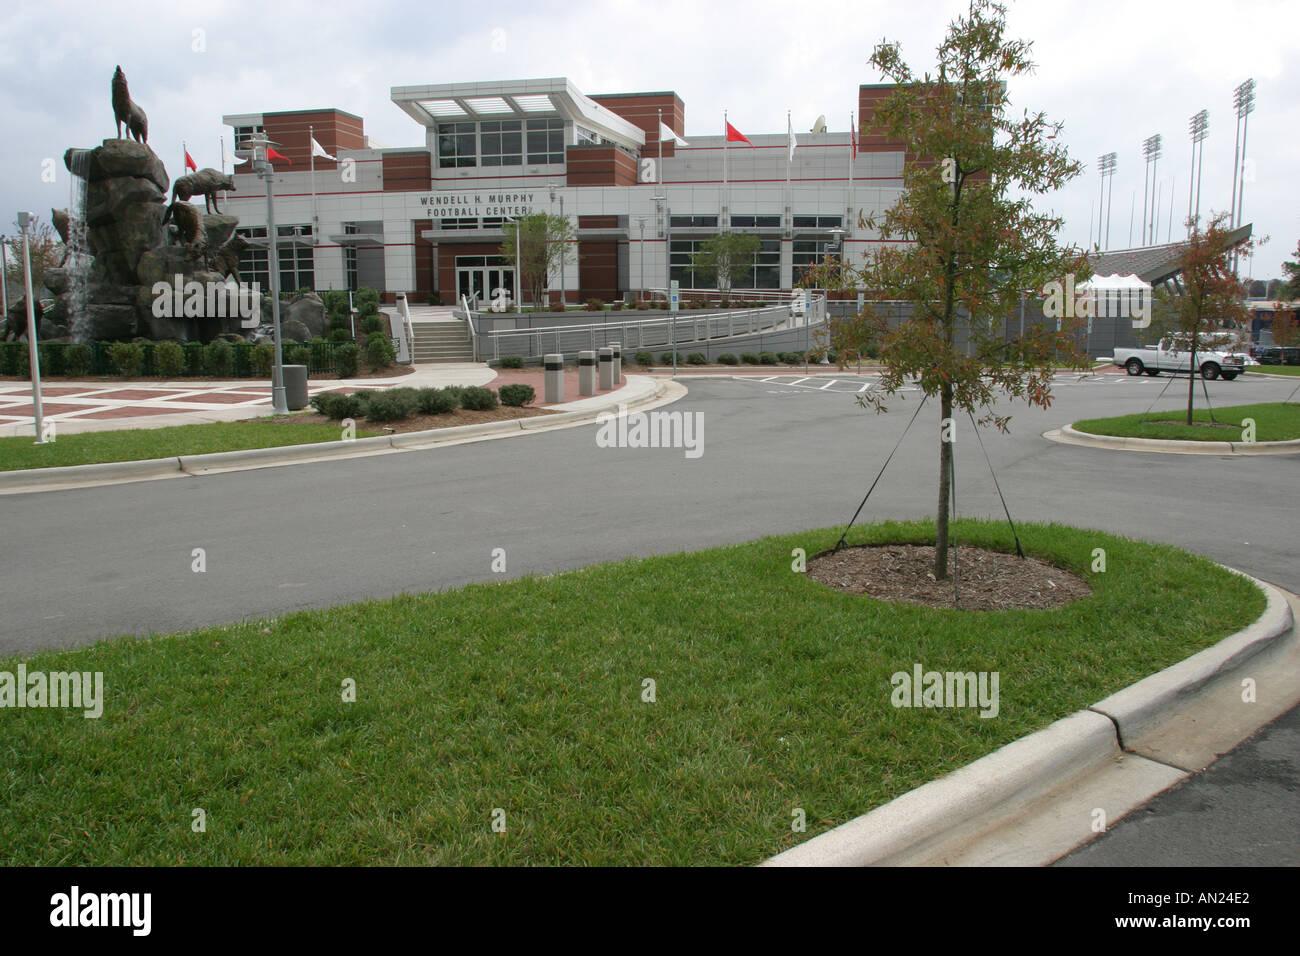 North Carolina, South, Tar Heel State, Wake County, Raleigh, Carter Finley Stadium, home, residence, house home Stock Photo